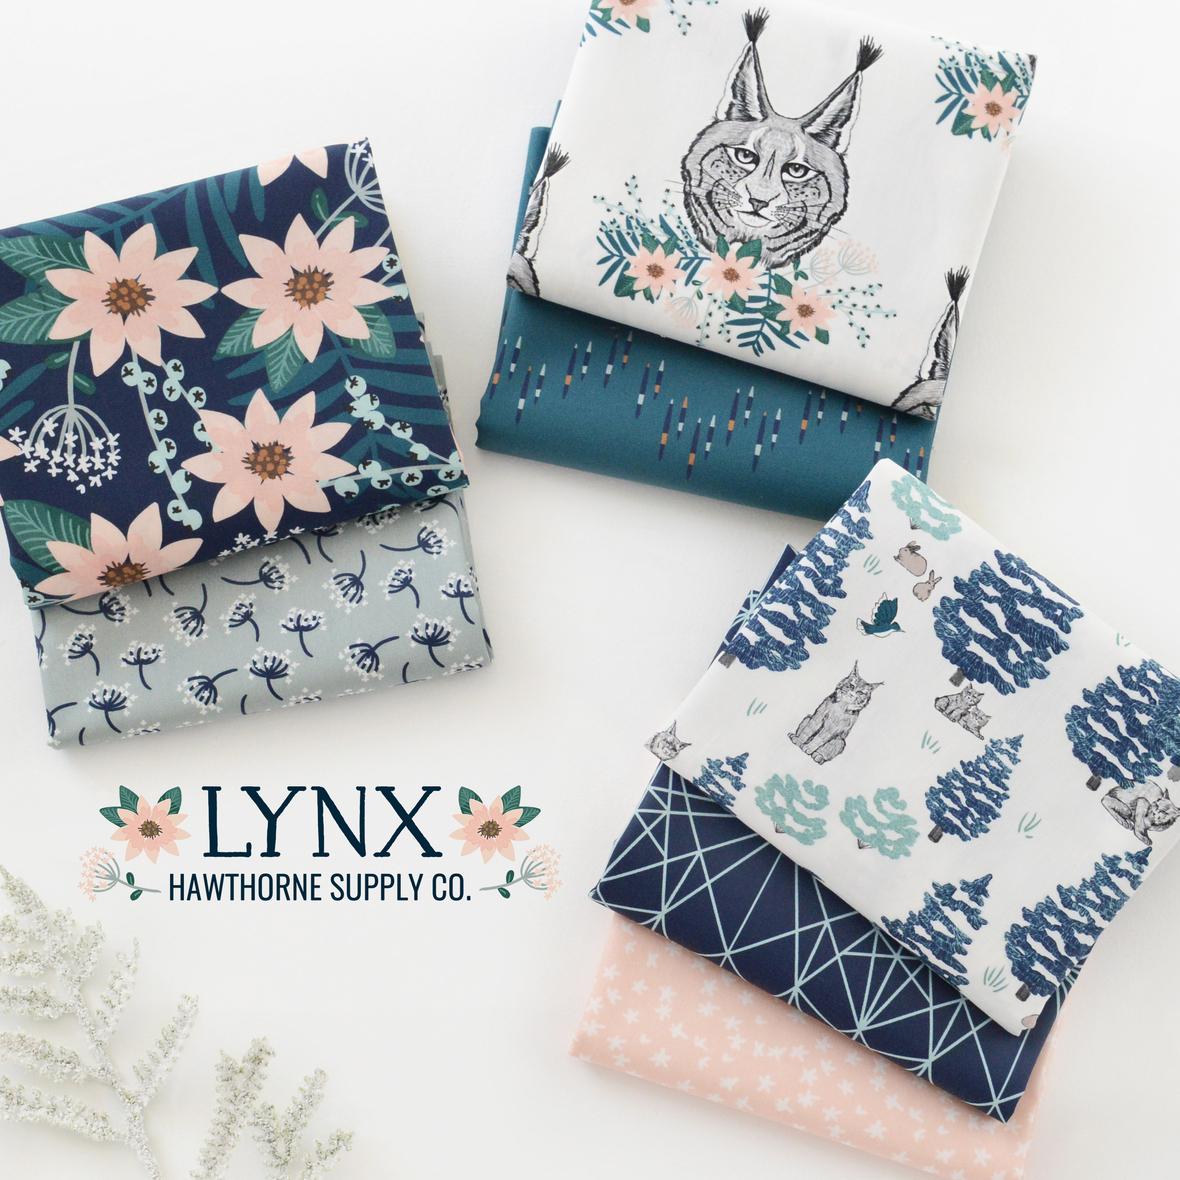 Lynx Fabric Poster 1